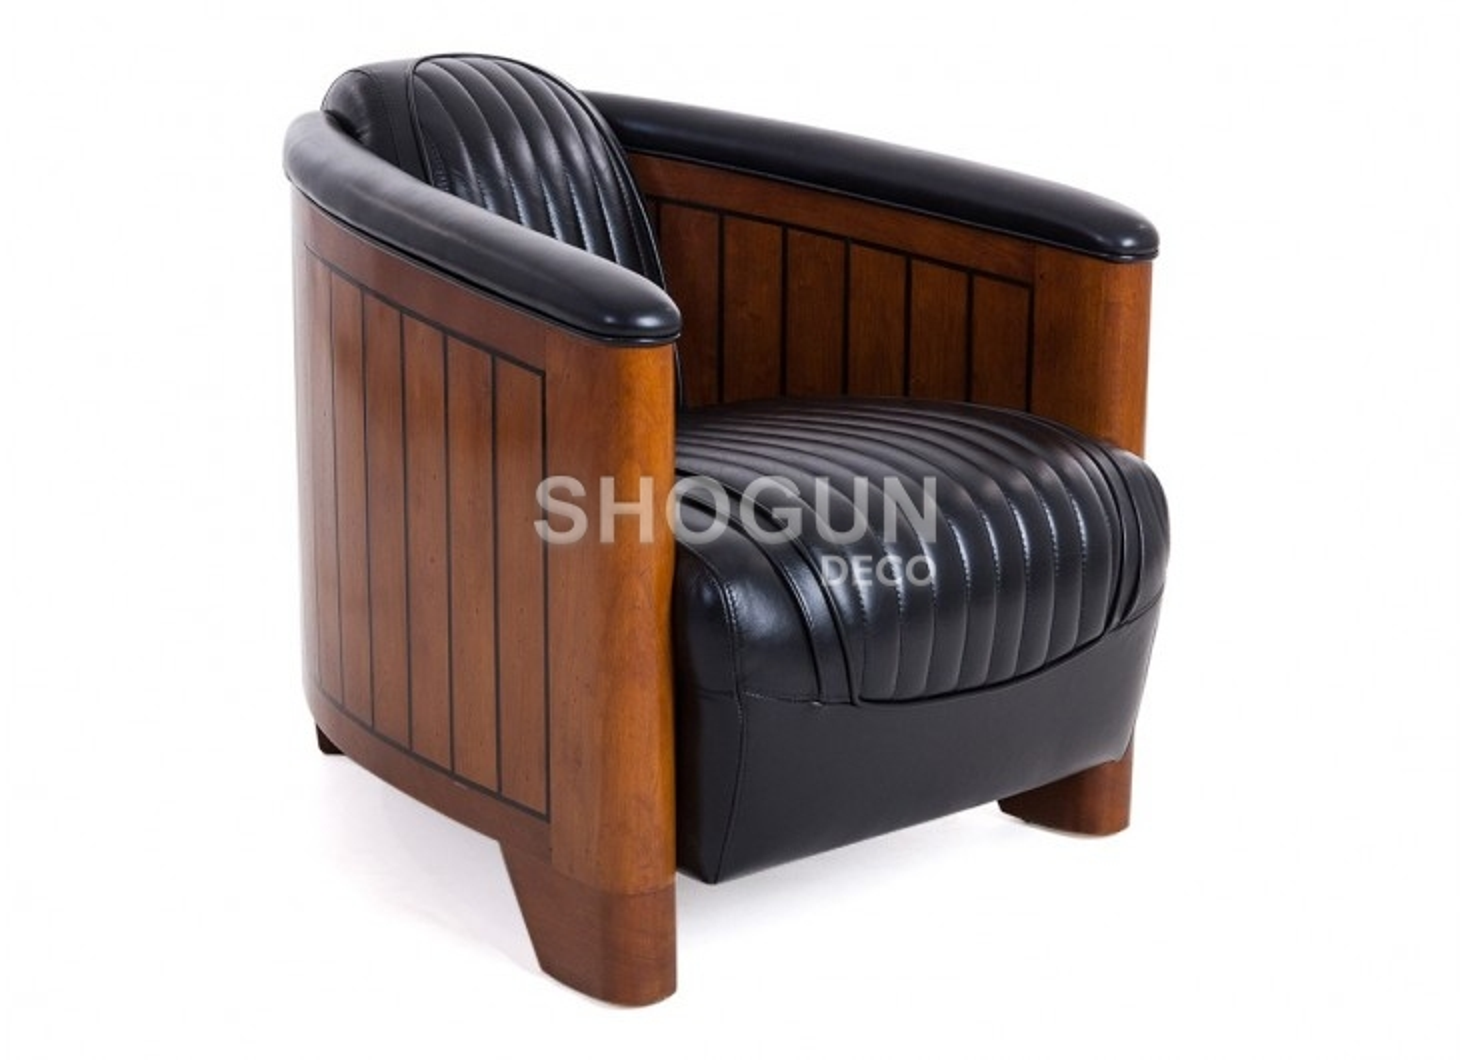 Canoë armchair - Black leather